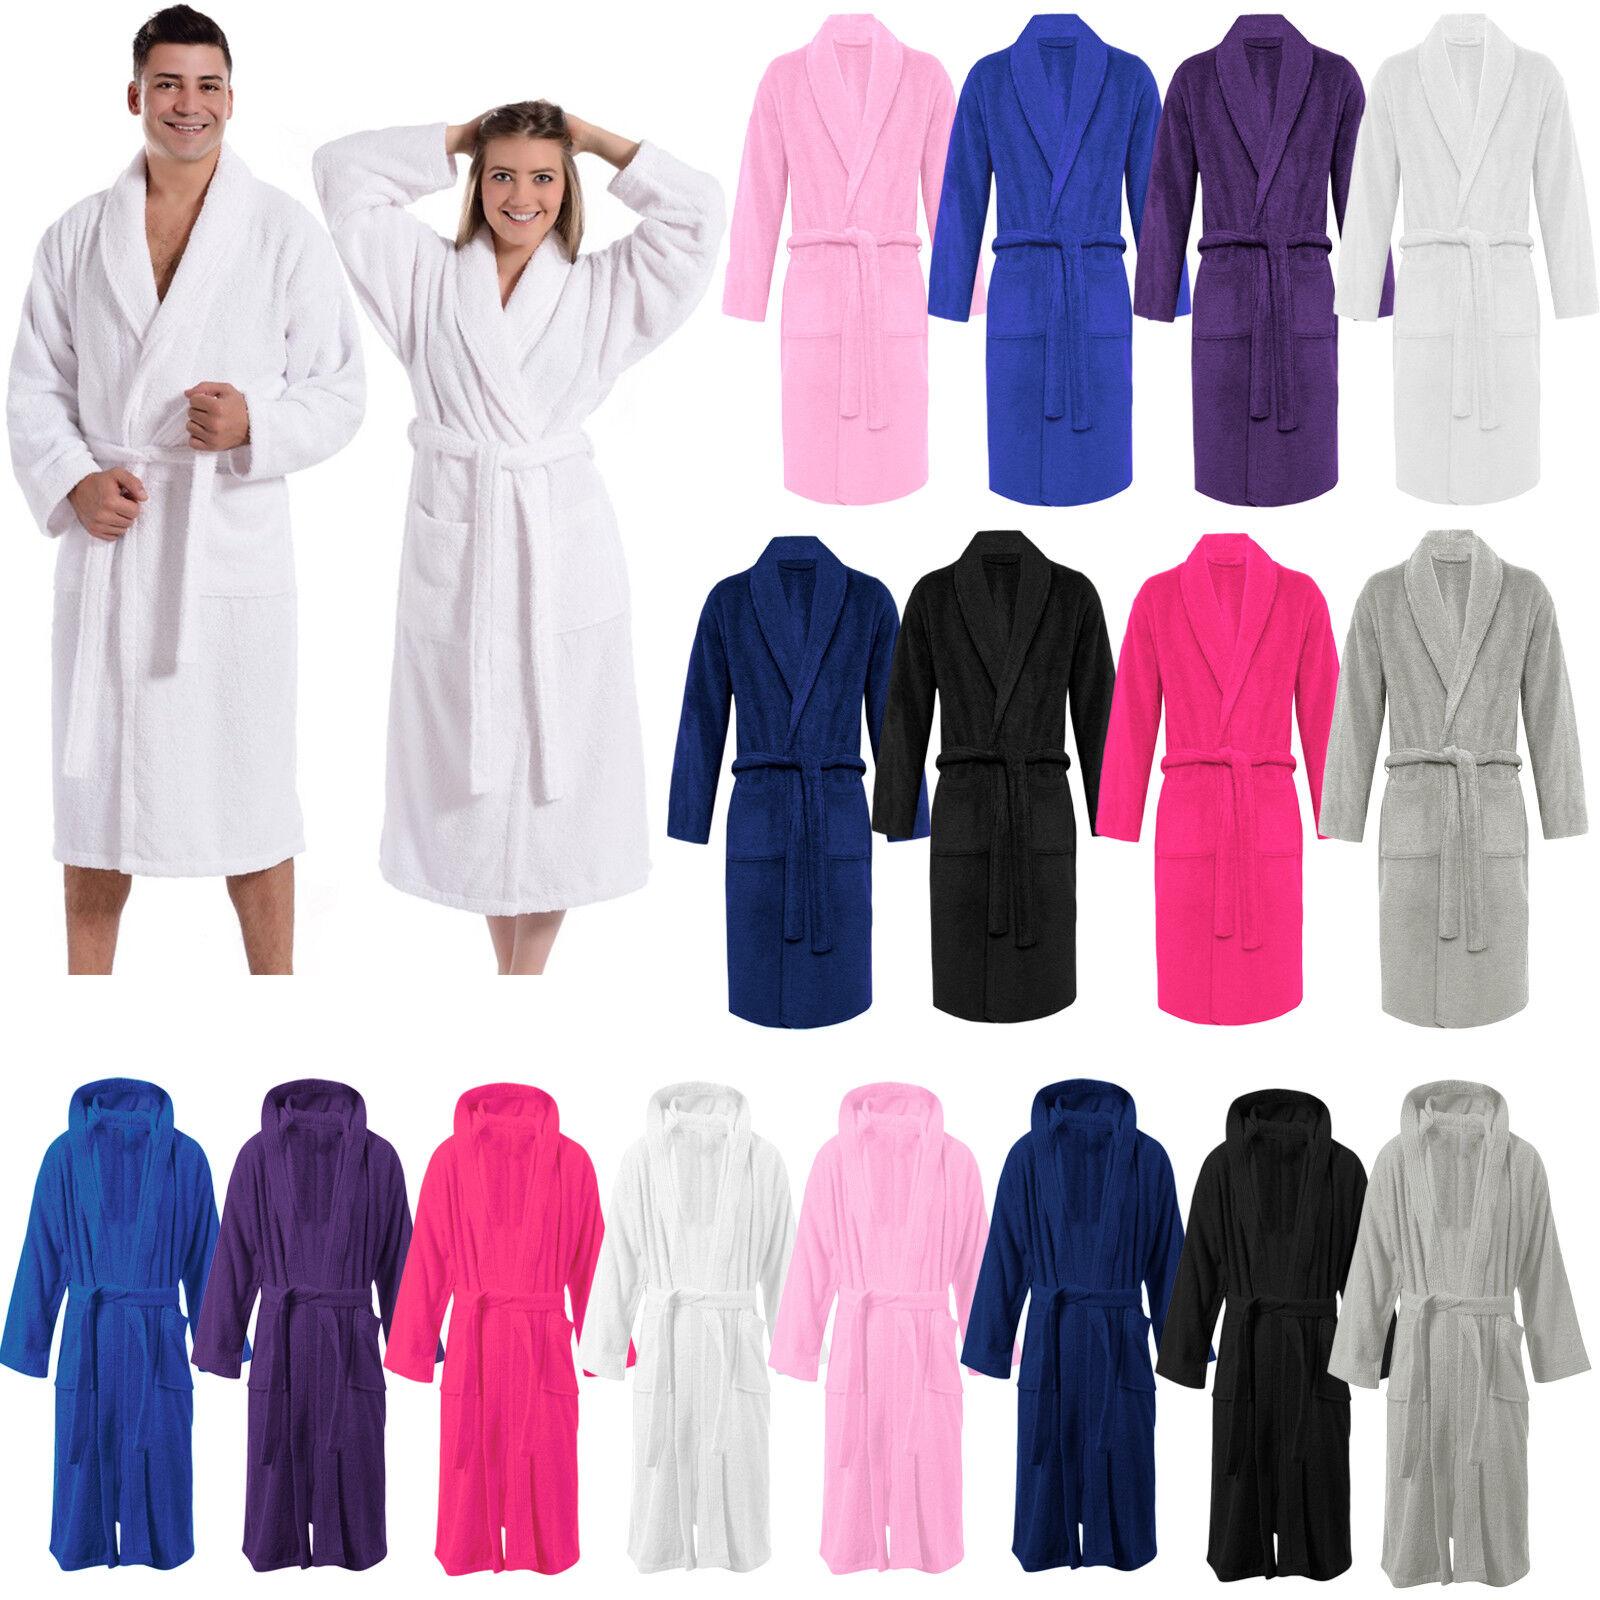 Women// Men// Unisex Towelling Cotton Soft Towel Shawl Collar Bath Robe Dress Gown